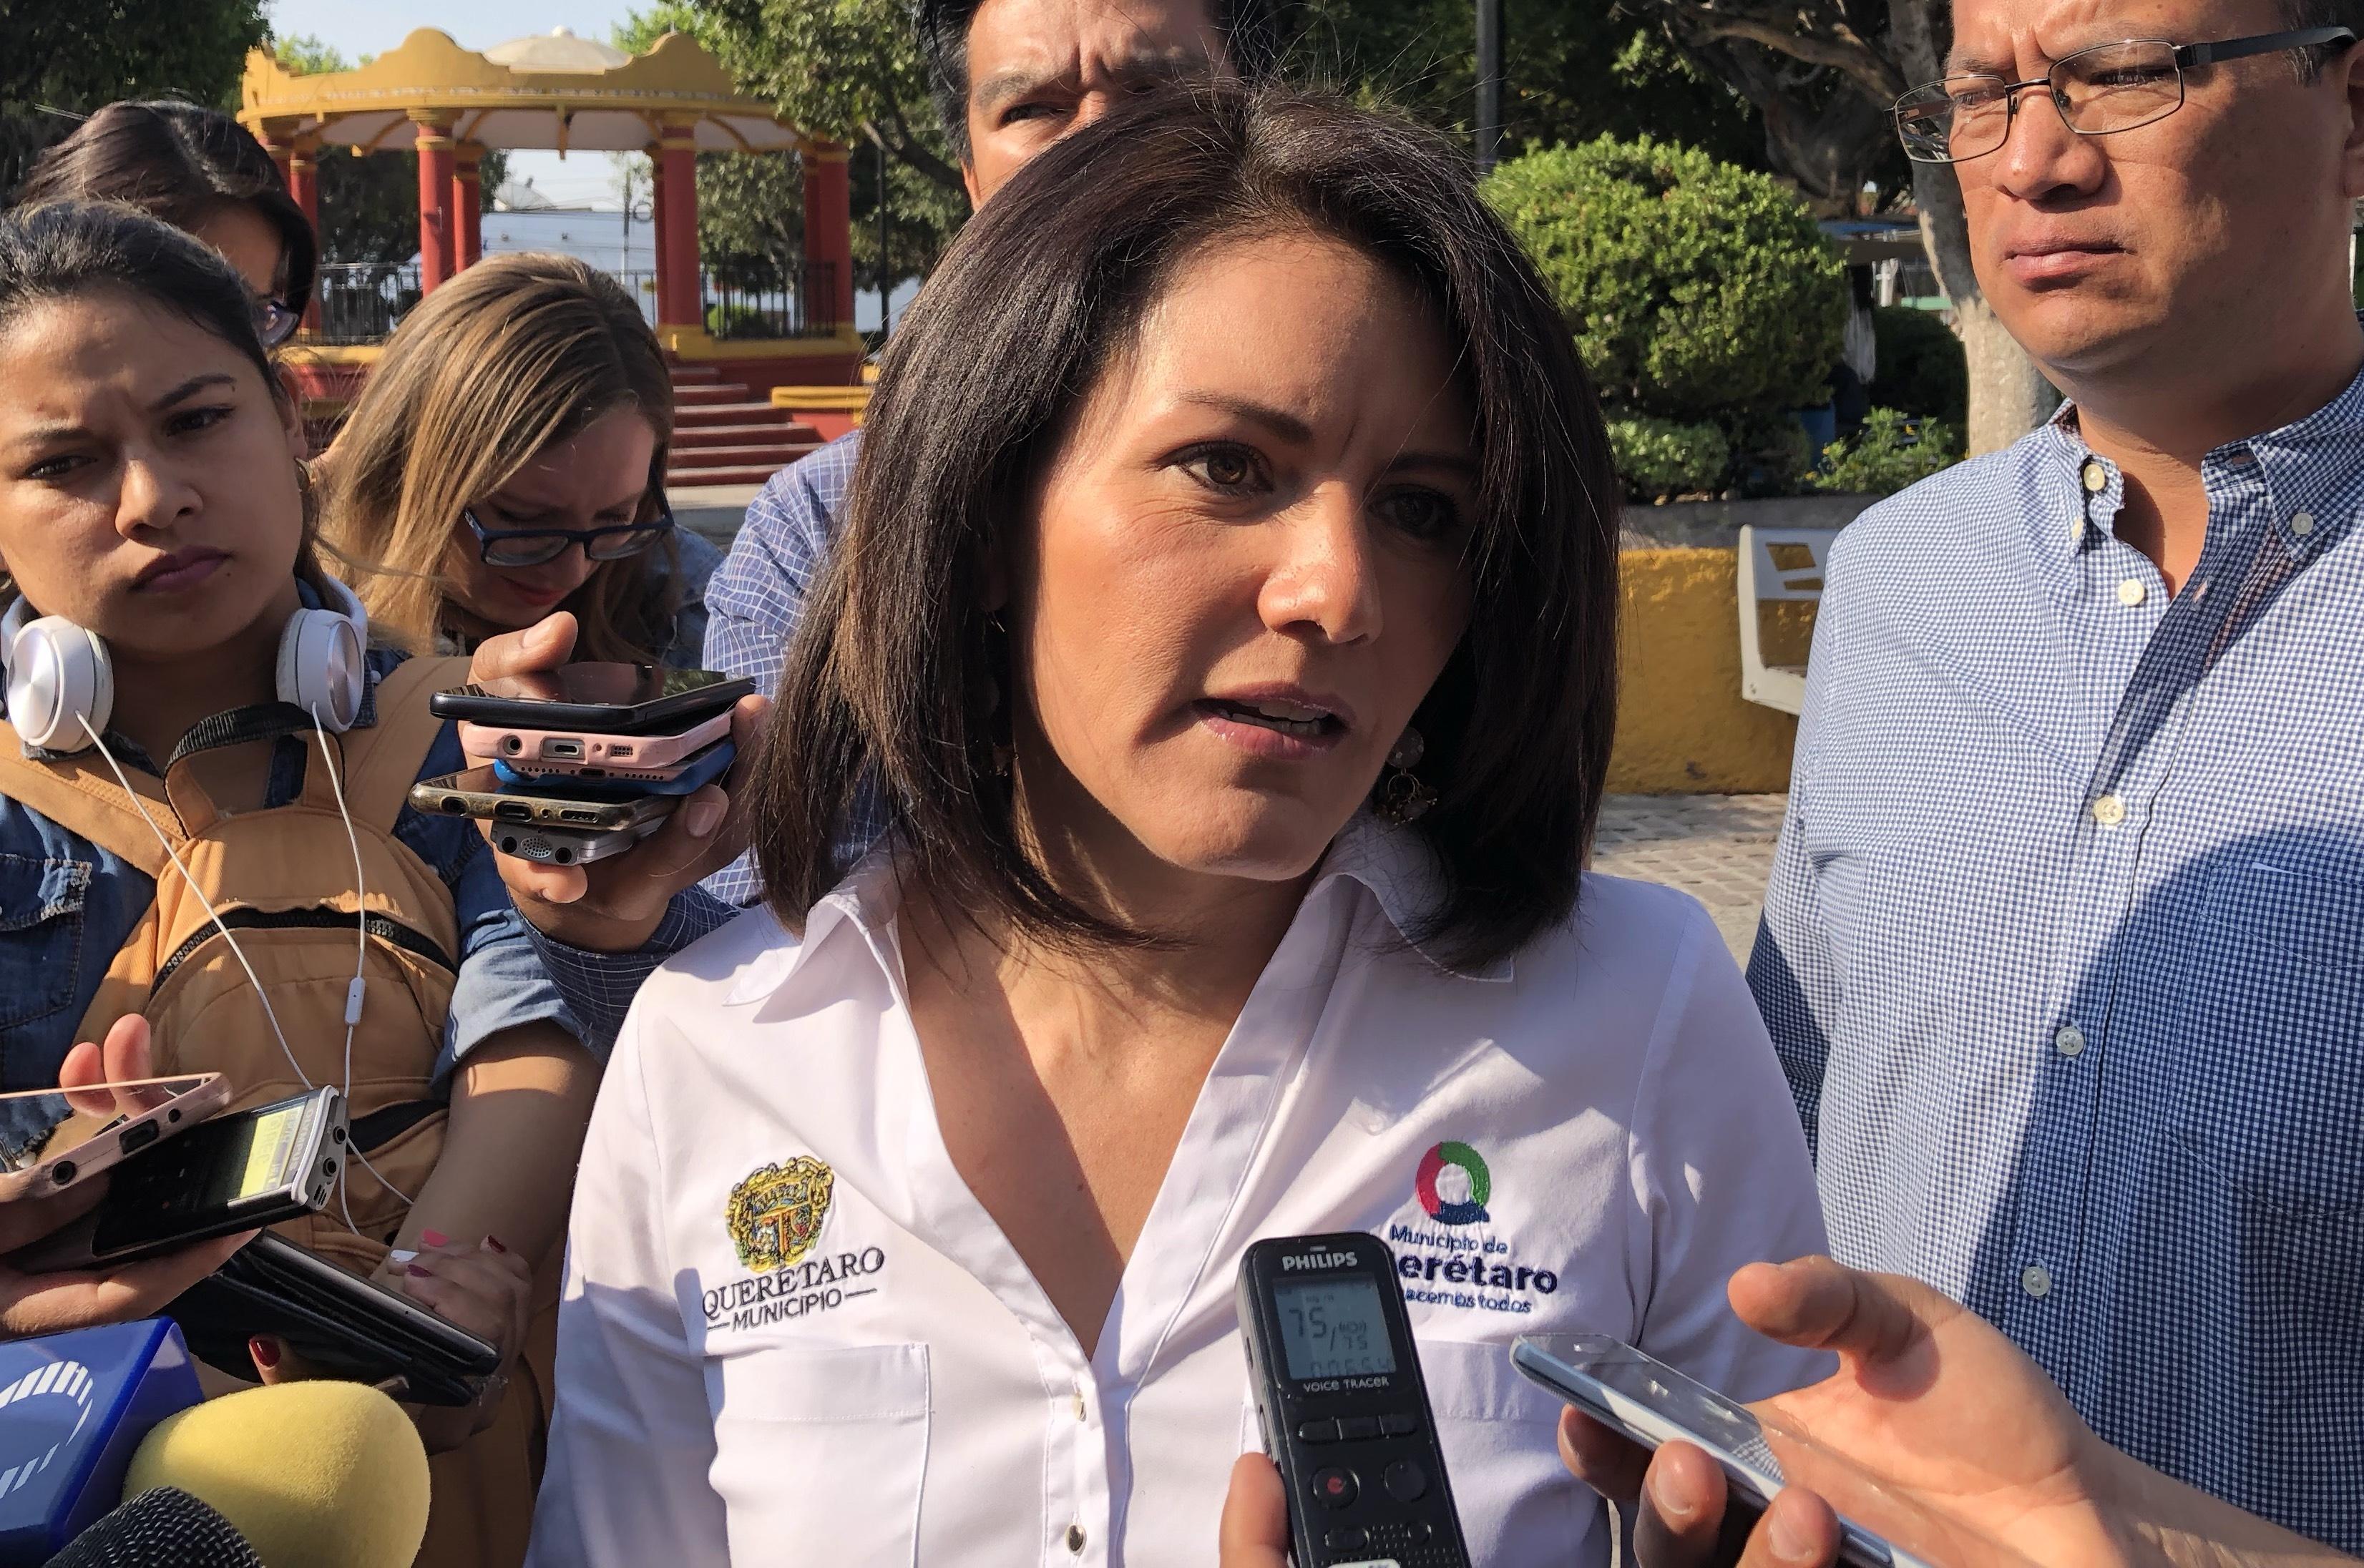 Capital anuncia programa de rescate del Río Querétaro